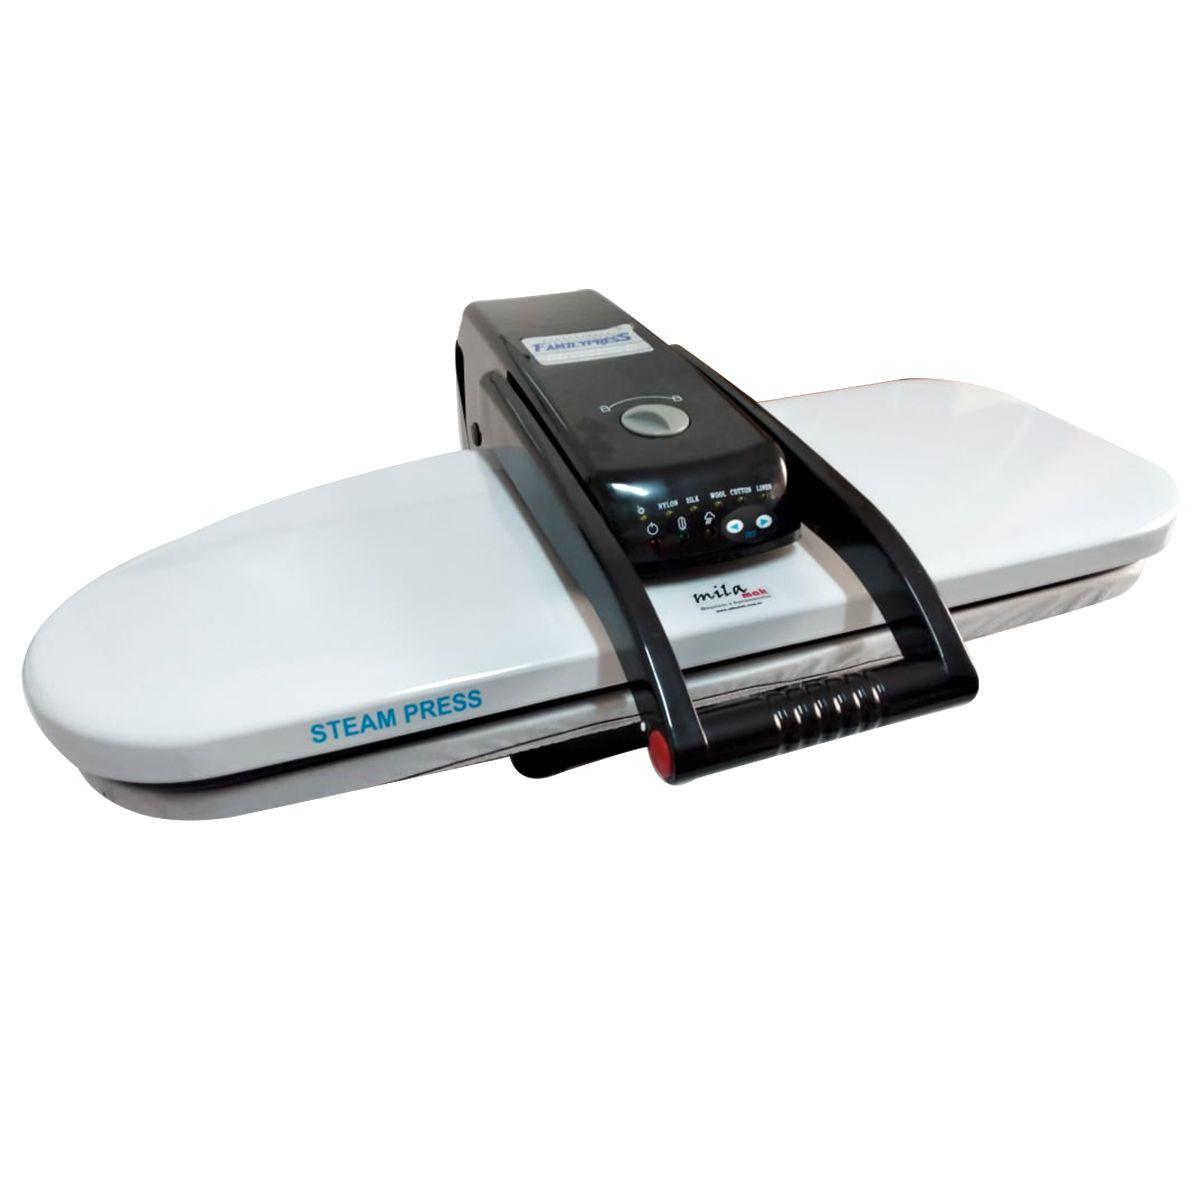 Prensa de passar roupas Doméstica a Vapor 1600 watts de potência - área de 66 x 25 cm